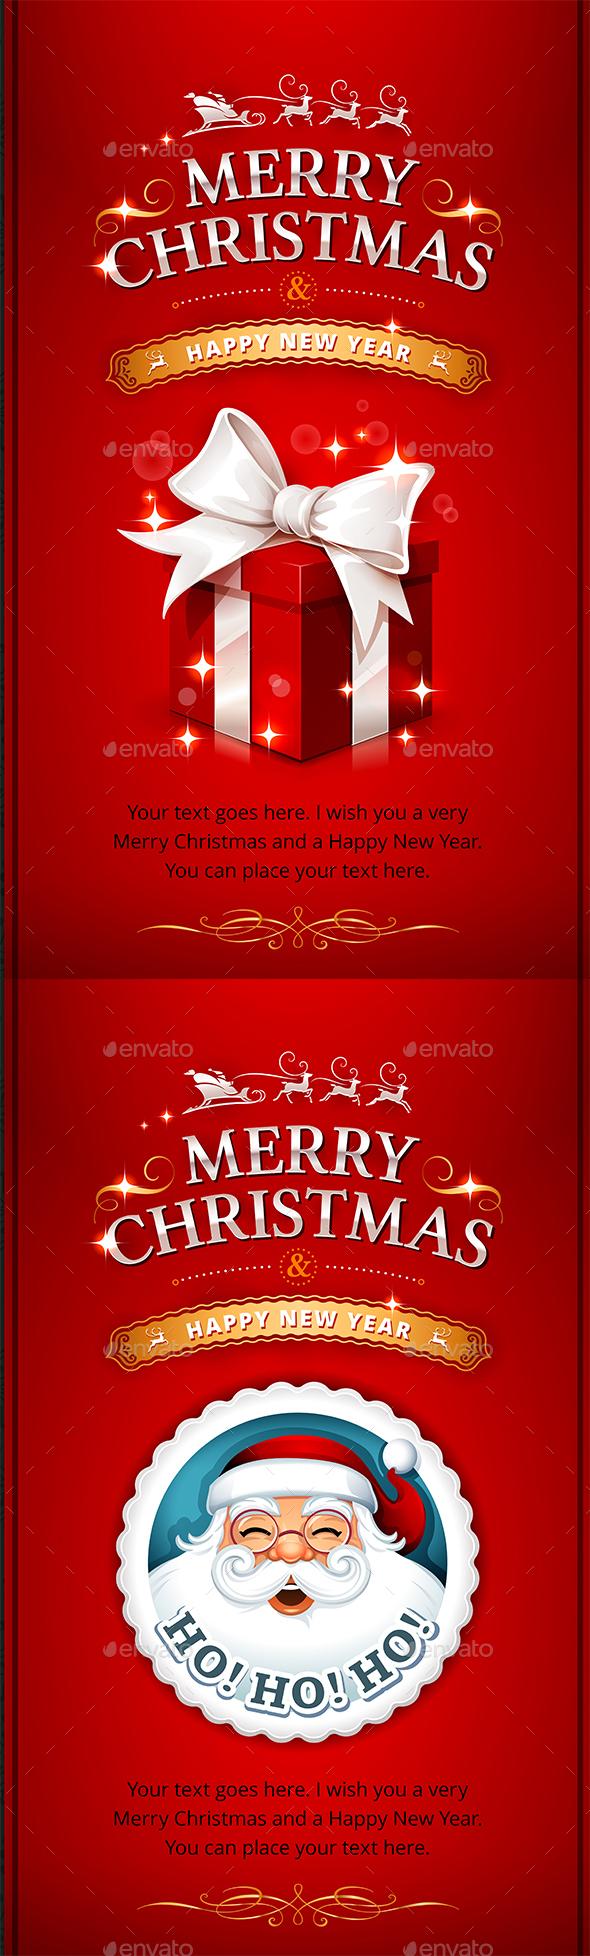 GraphicRiver Christmas Card 21055109